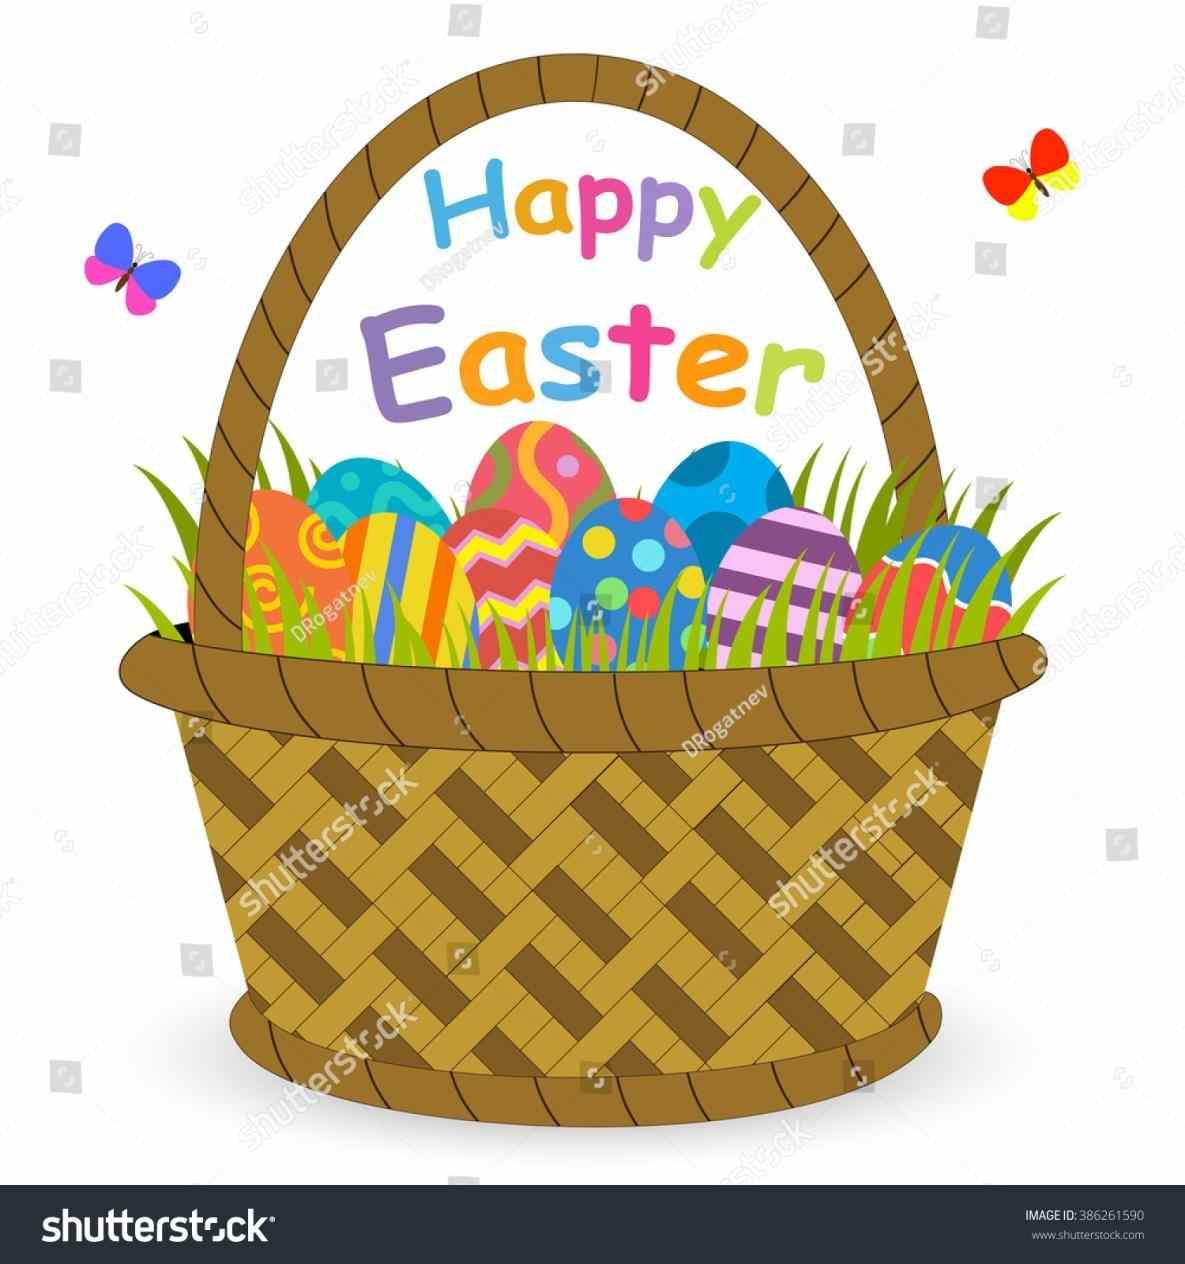 Basket clipart cartoon. Easter egg sparkassess com